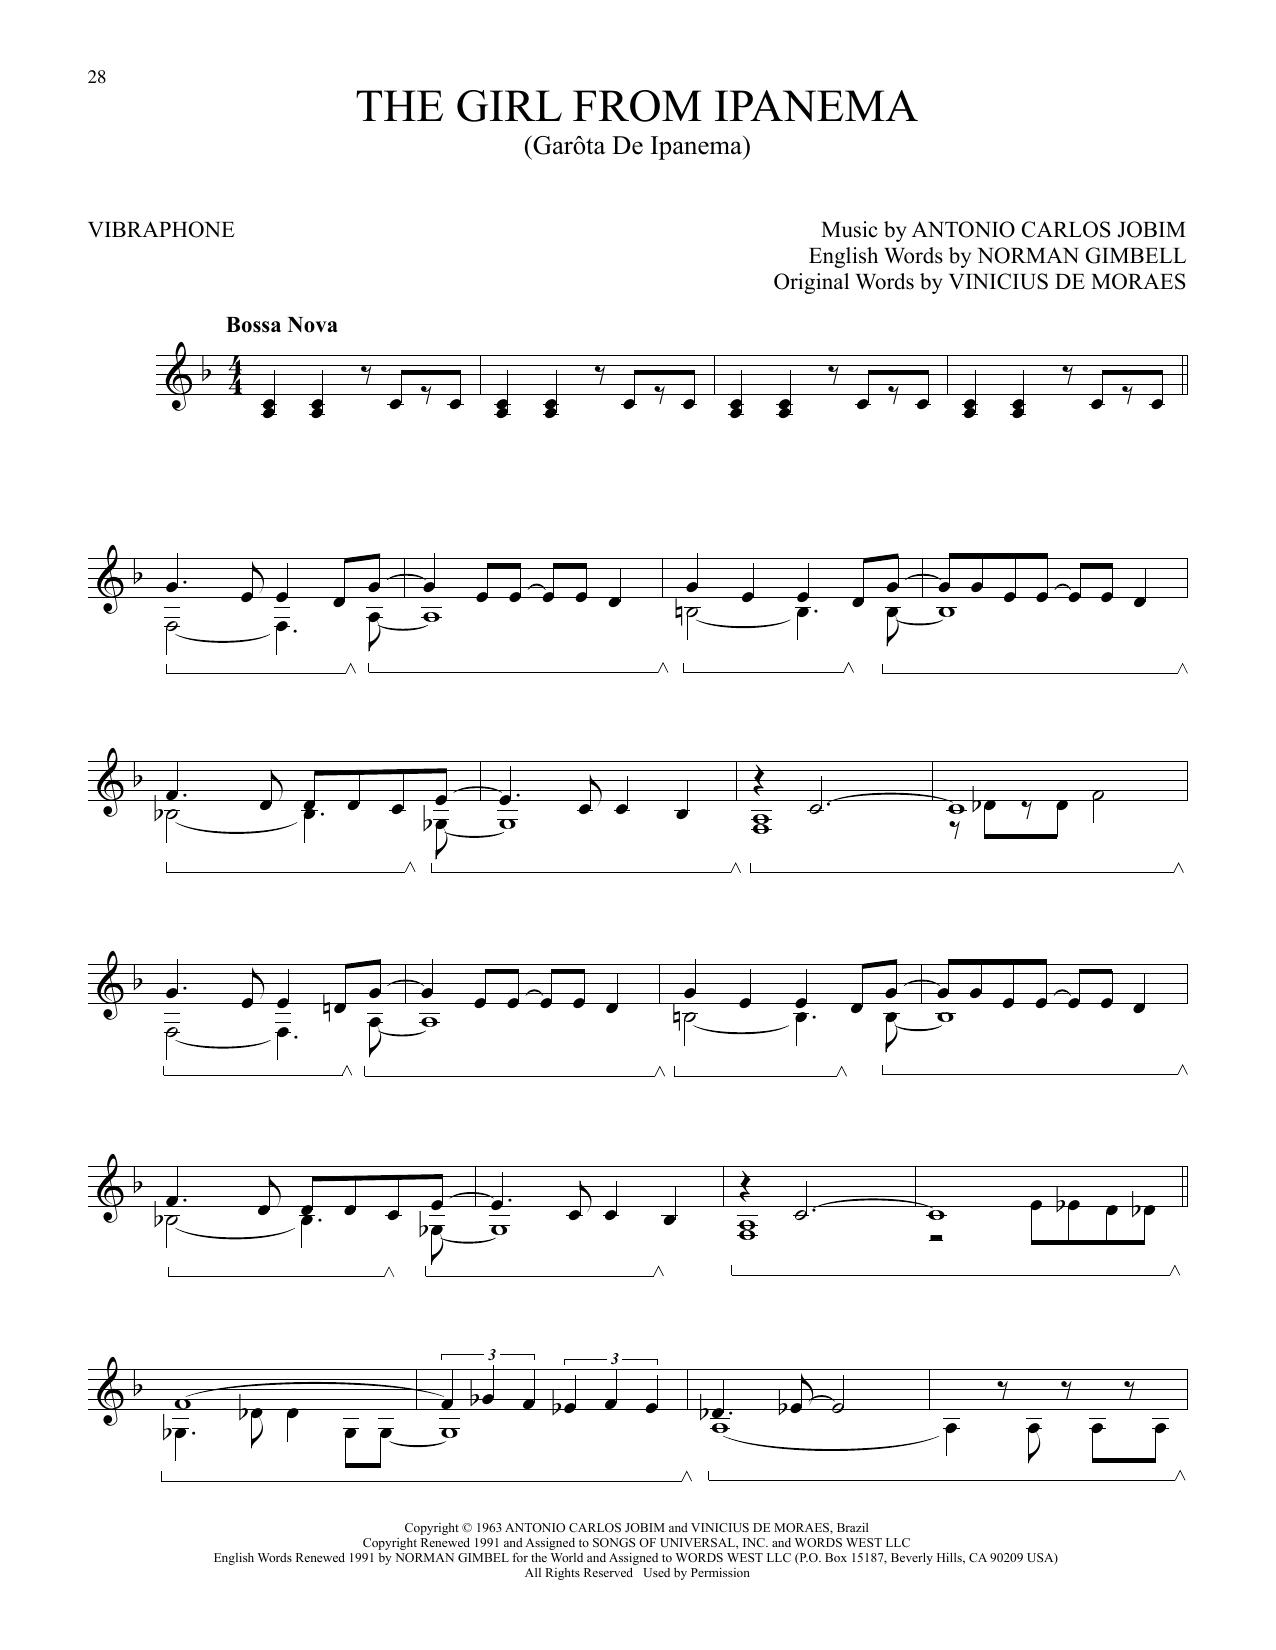 The Girl From Ipanema (Garota De Ipanema) (Vibraphone Solo)